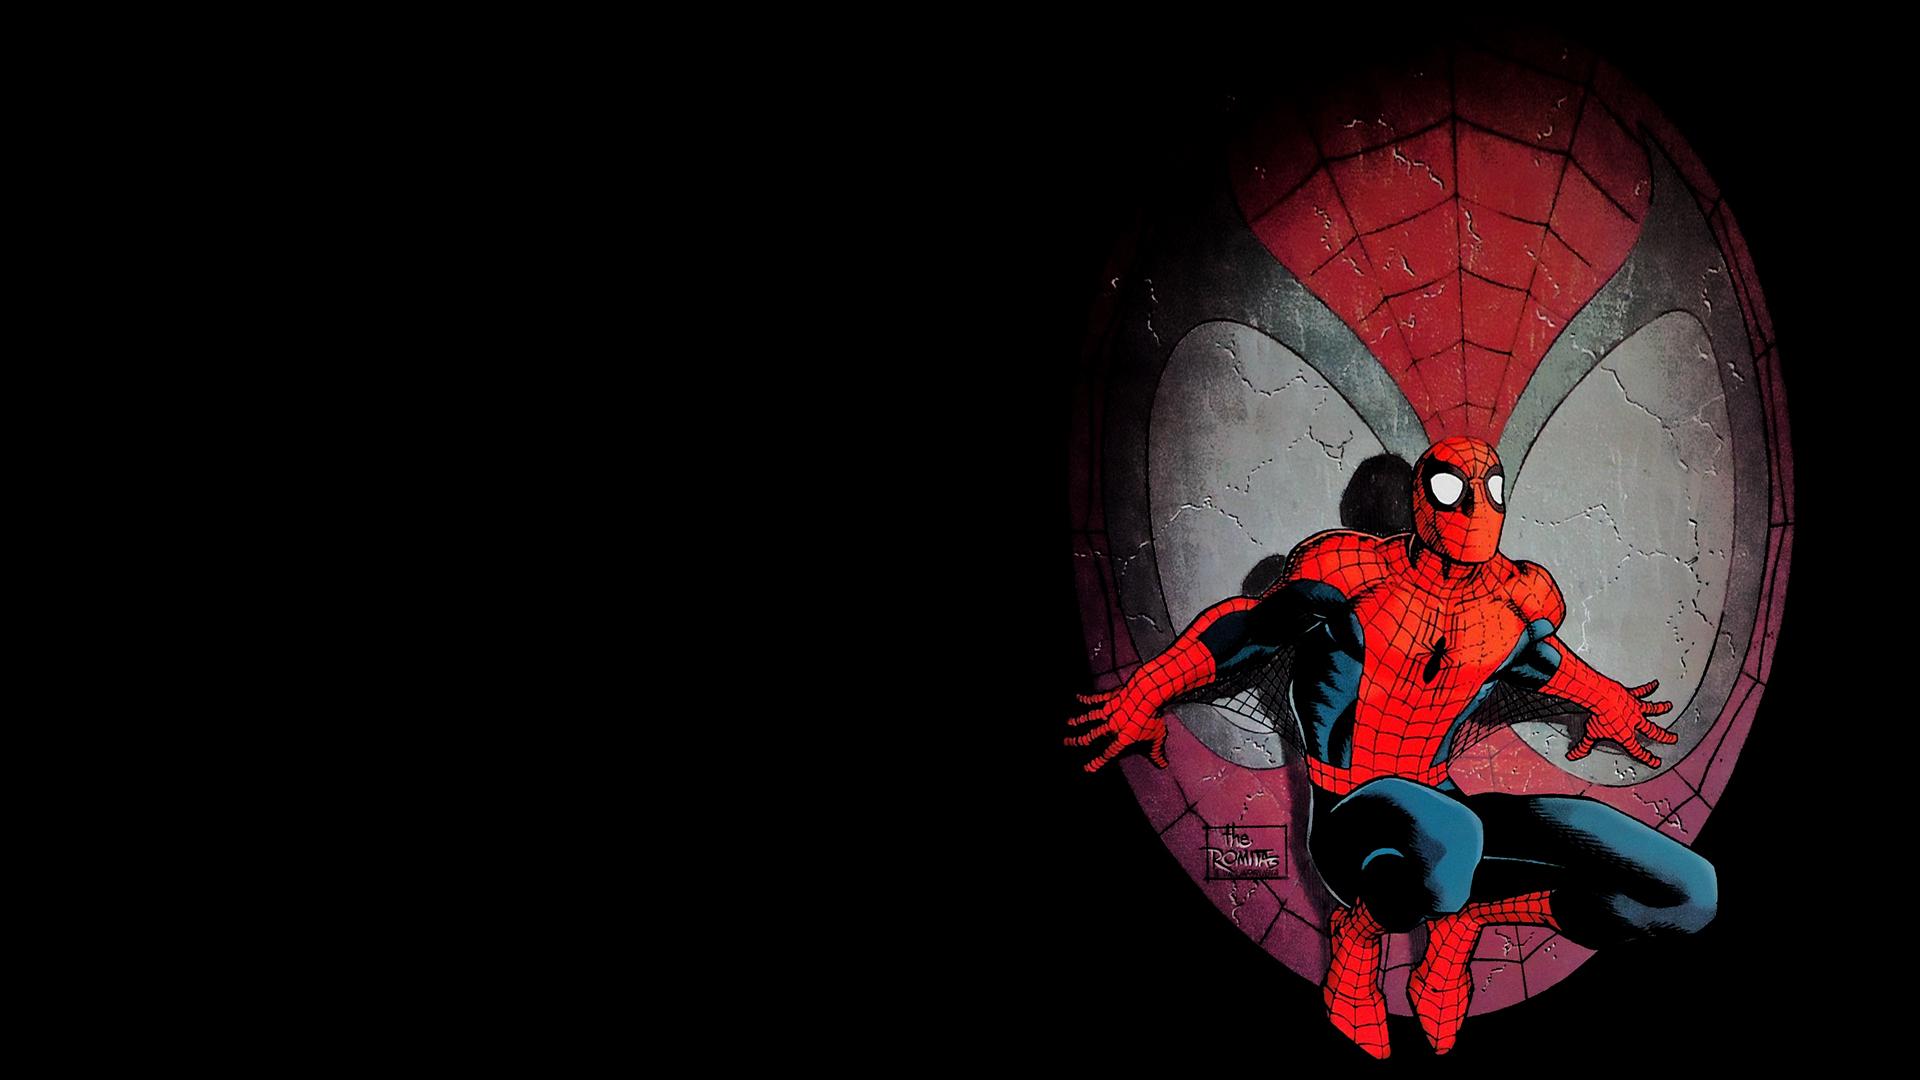 Spider Man Computer Wallpapers Desktop Backgrounds 1920x1080 ID 1920x1080